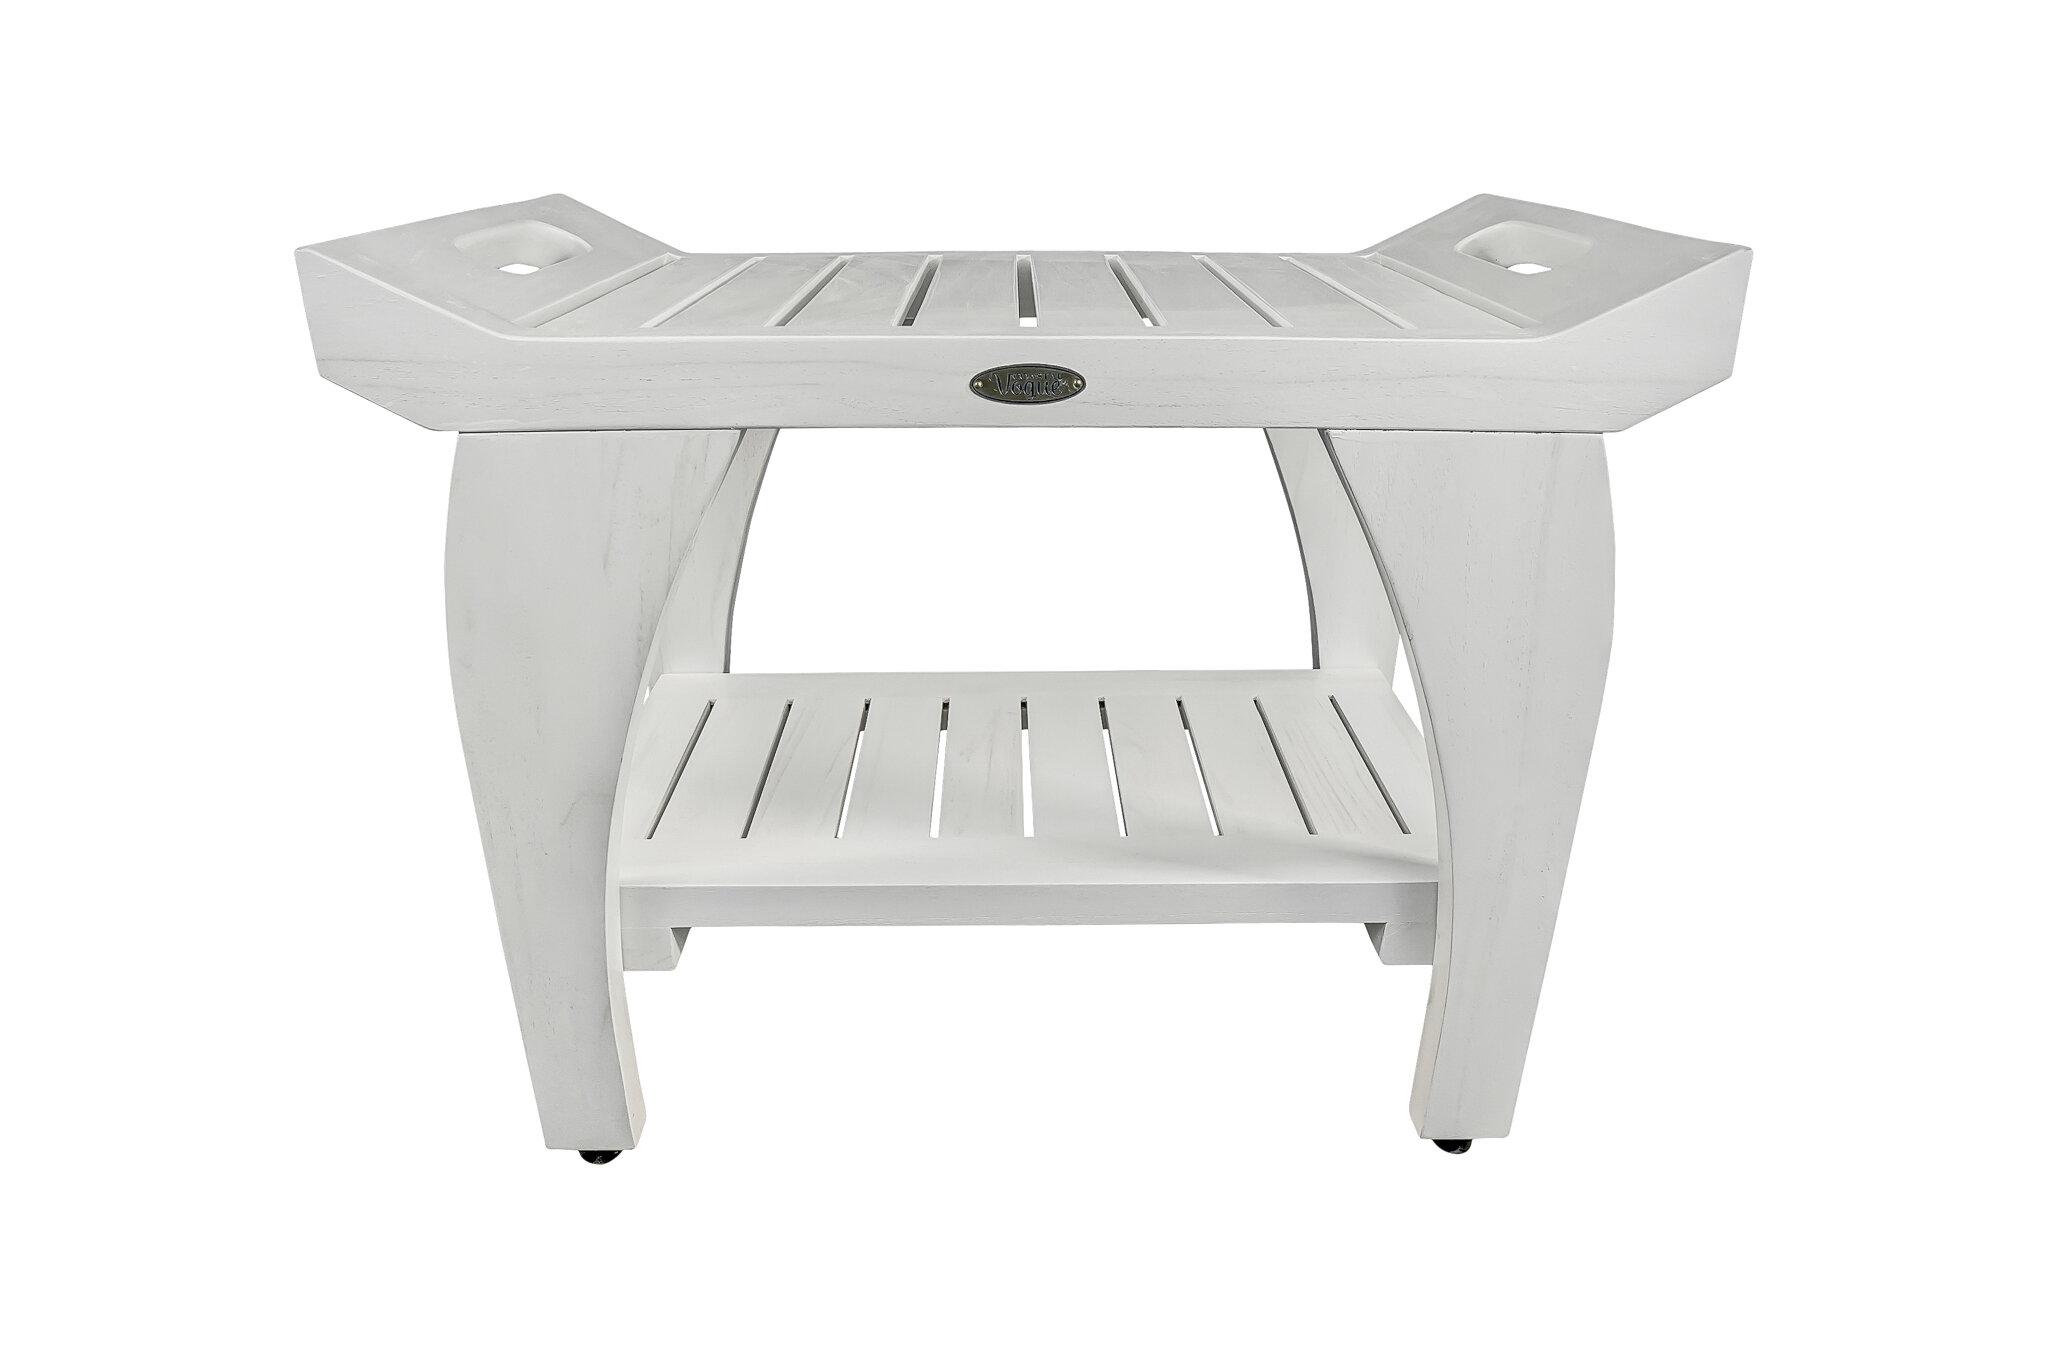 Ecodecors Tranquility 24 W Teak Shower Bench Reviews Wayfair